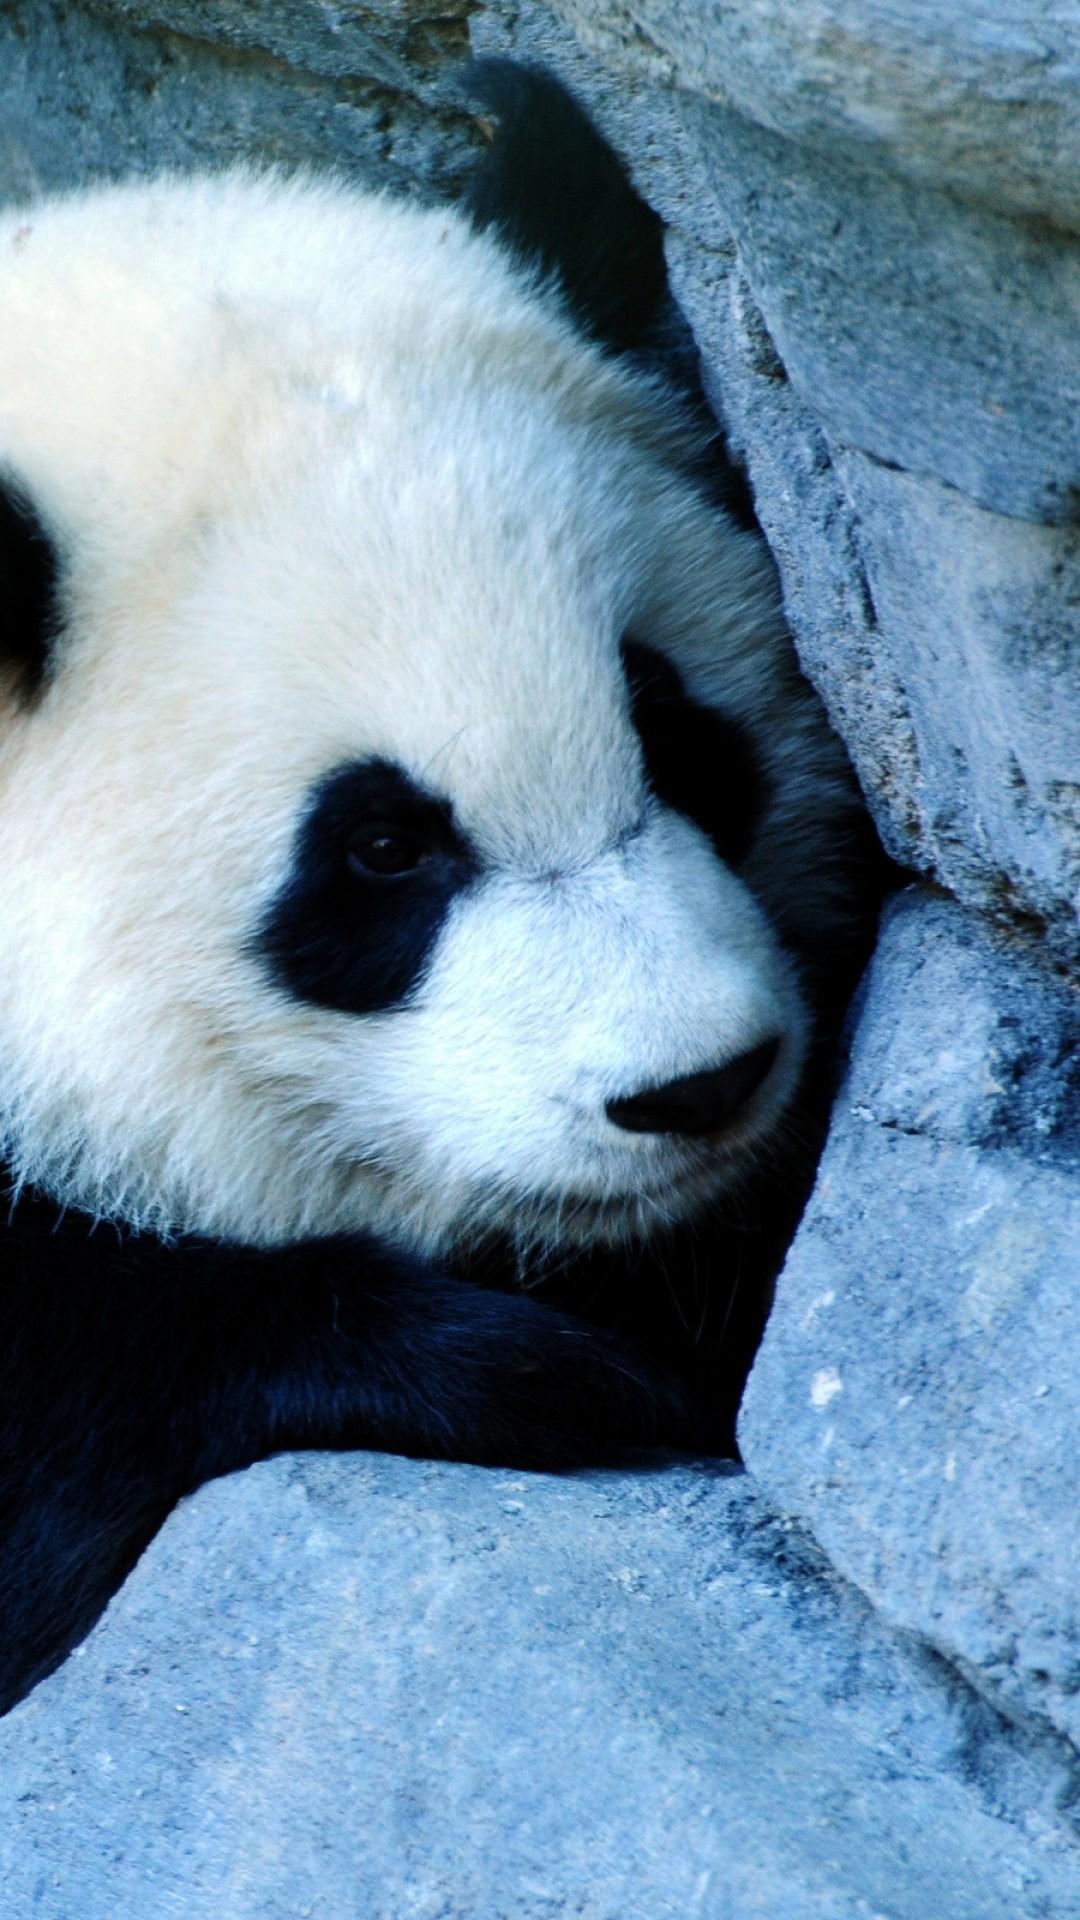 Wallpaper panda, wall, sadness, baby